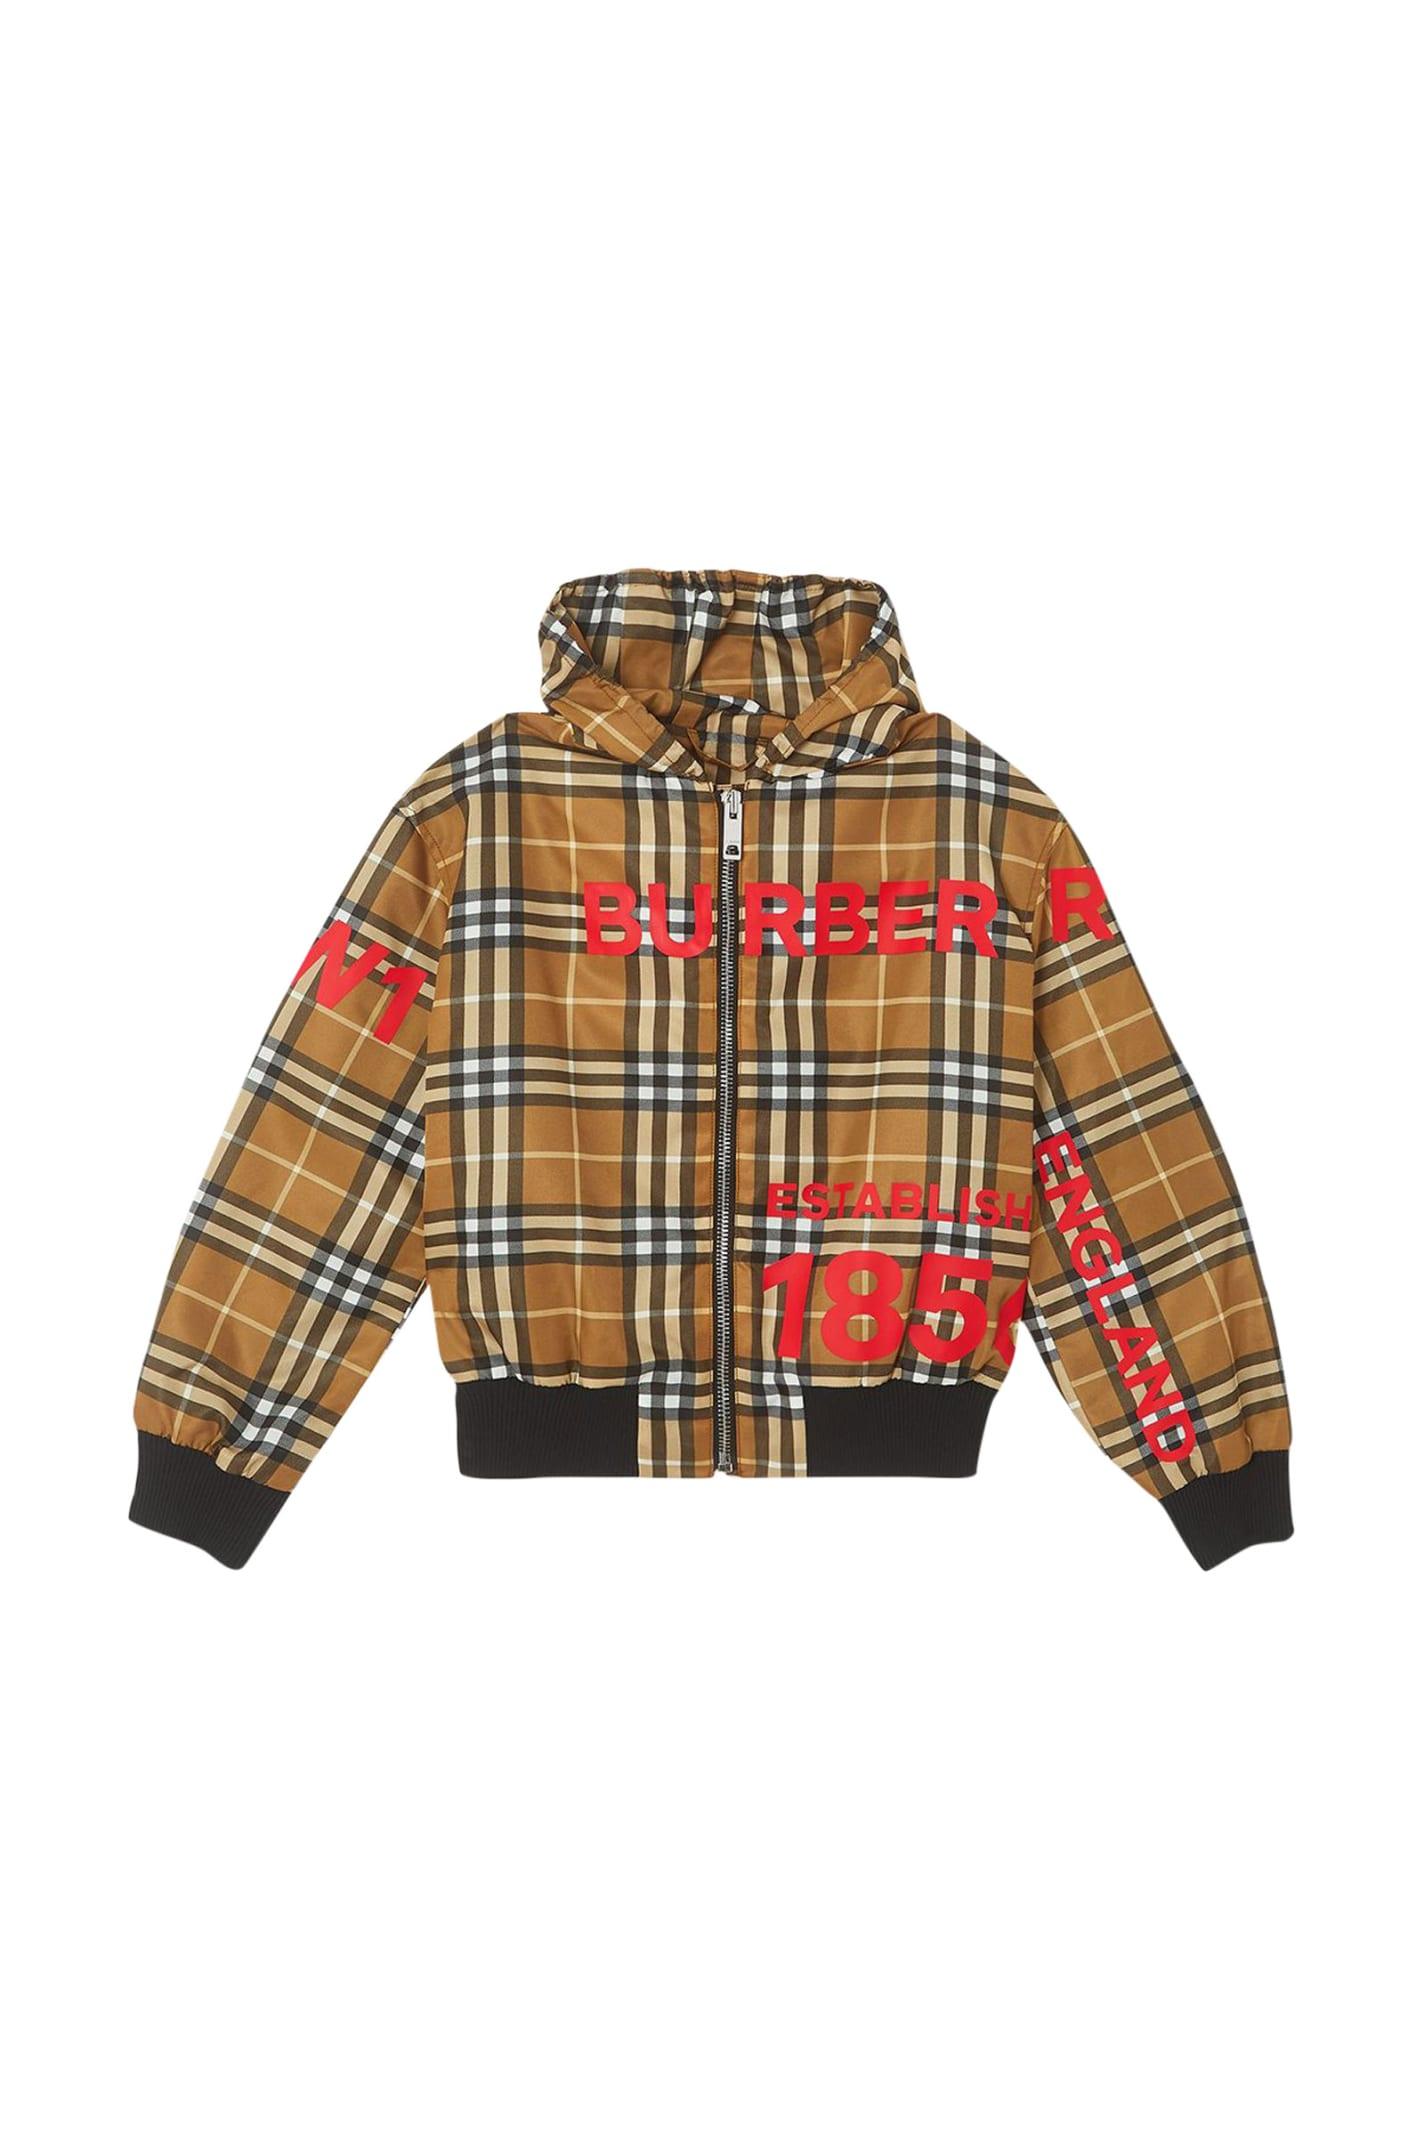 Burberry Kids Light Jacket